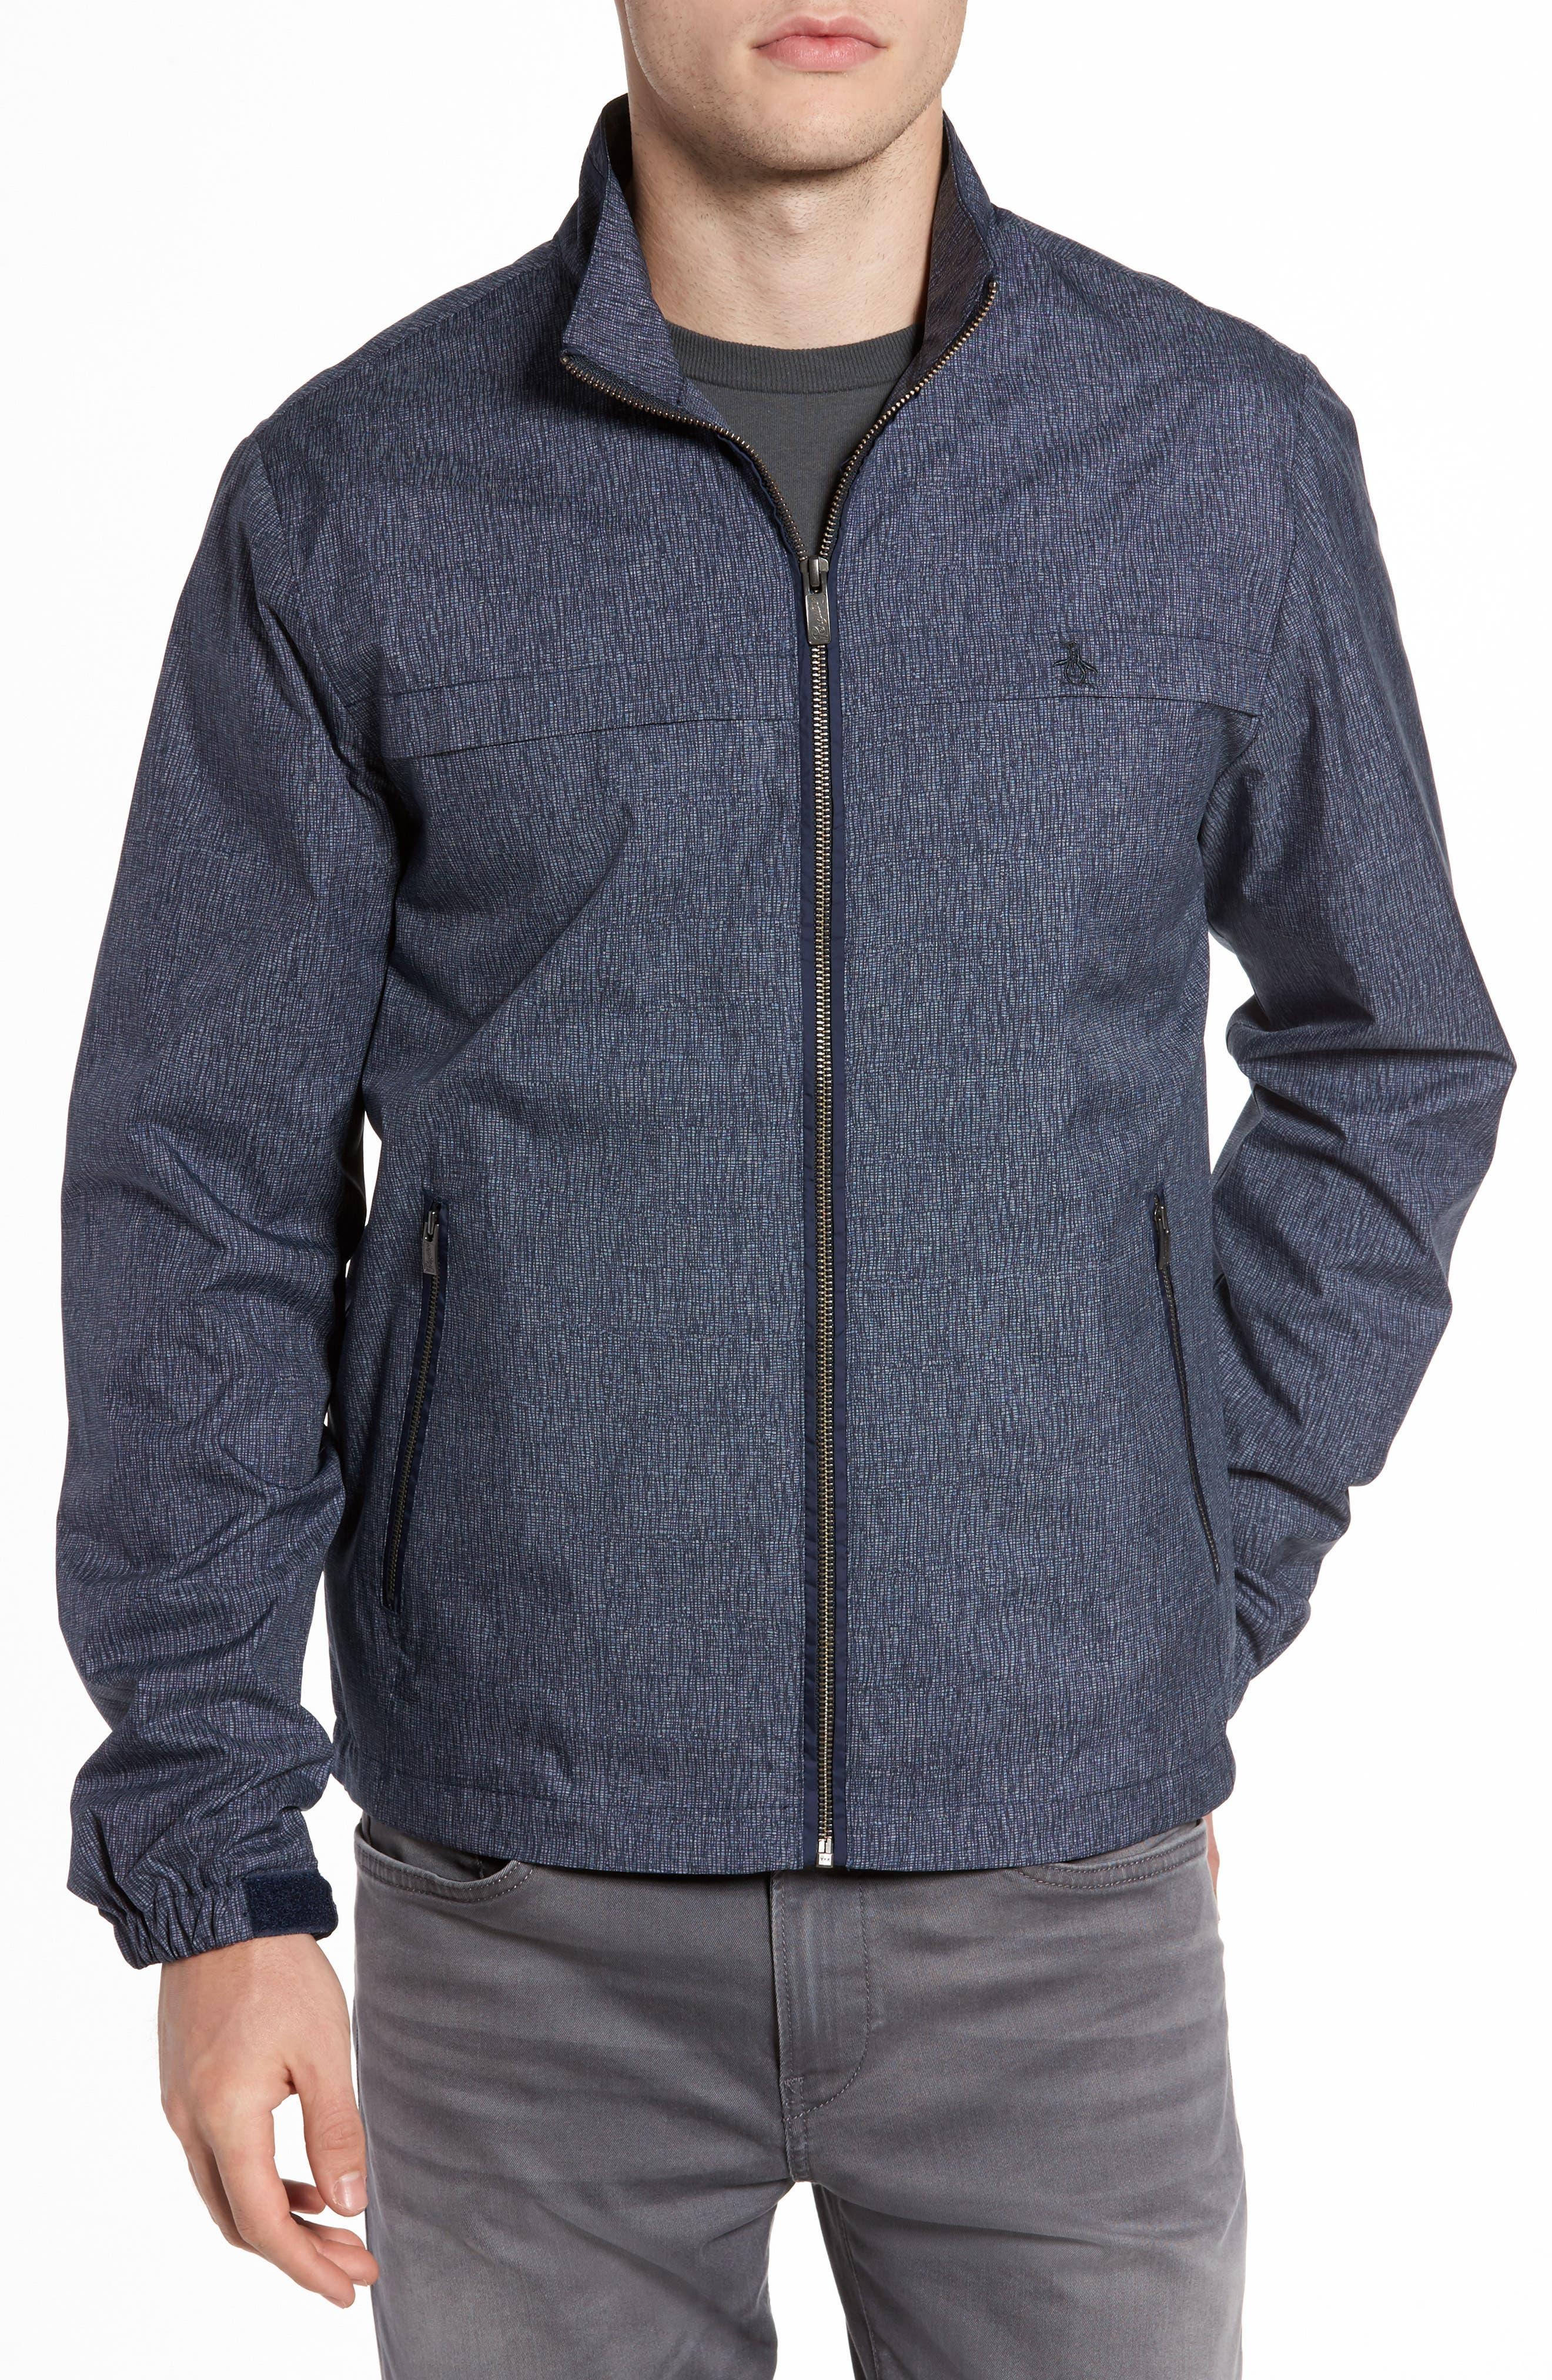 Ratner Water Resistant Jacket,                             Main thumbnail 1, color,